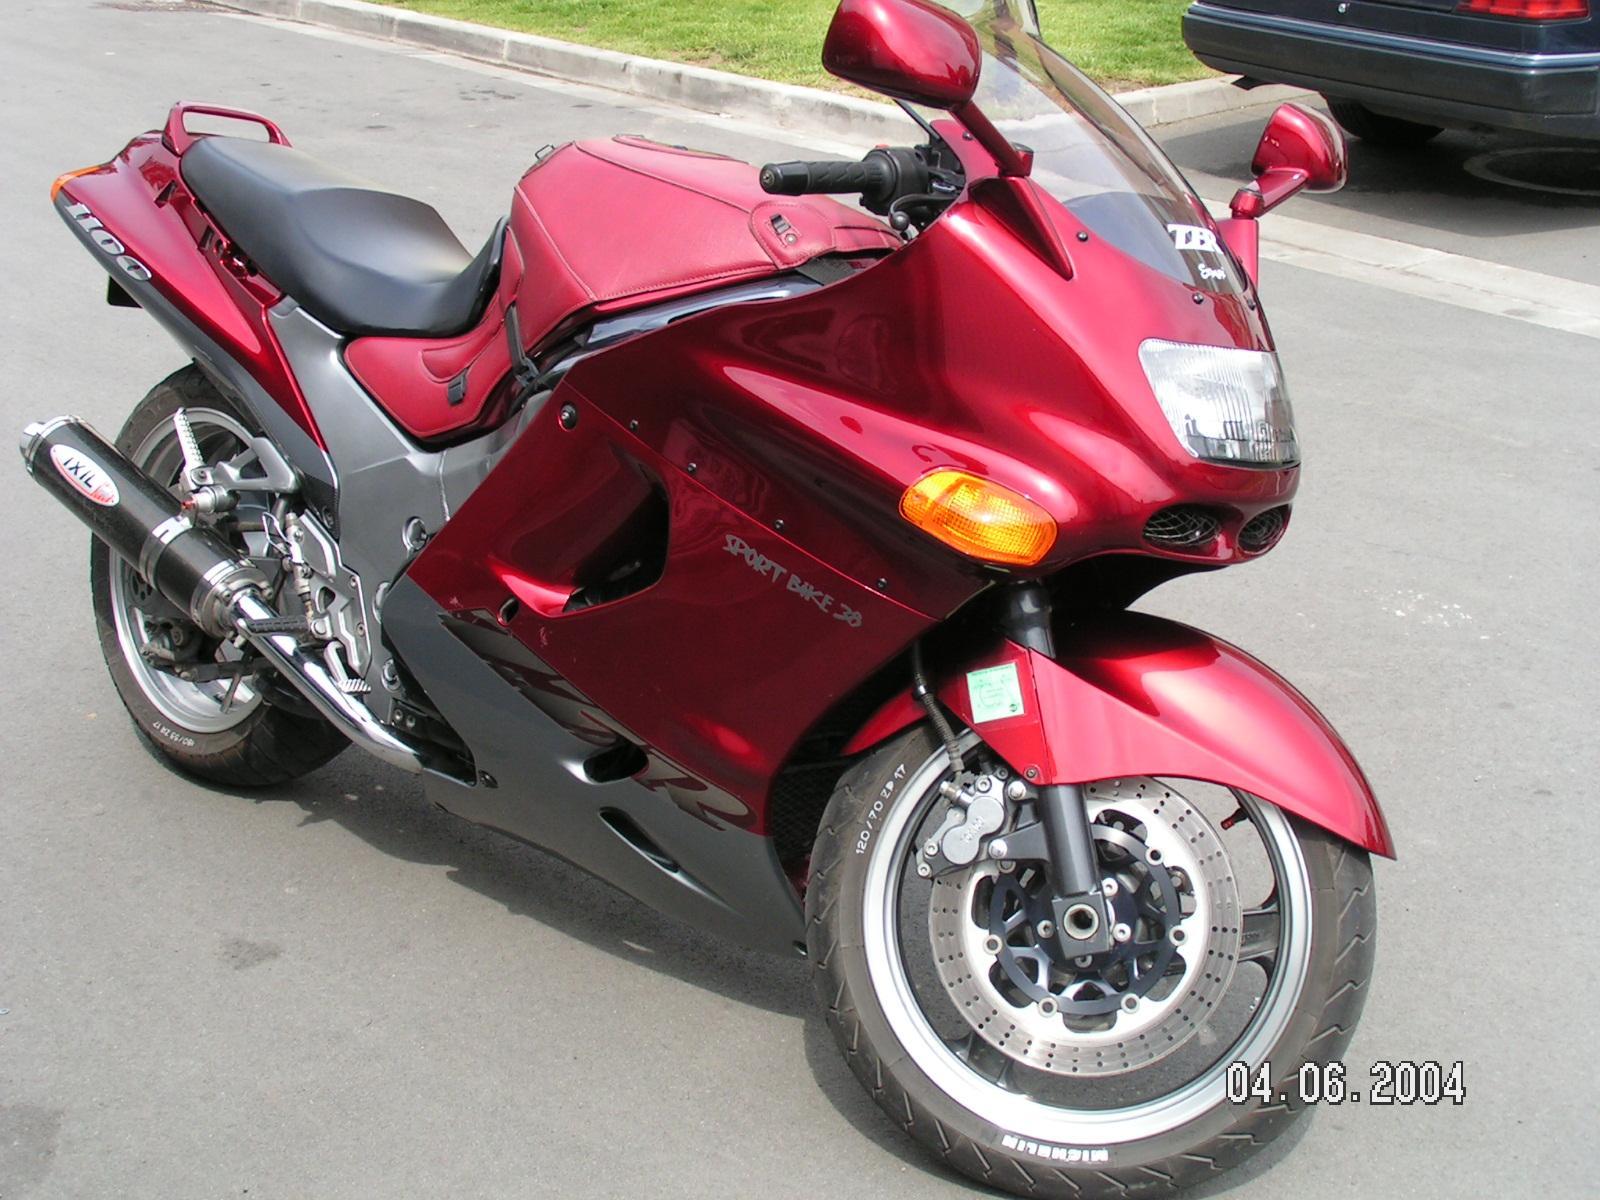 Kawasaki ZZR1100 photos - PhotoGallery with 4 pics ...